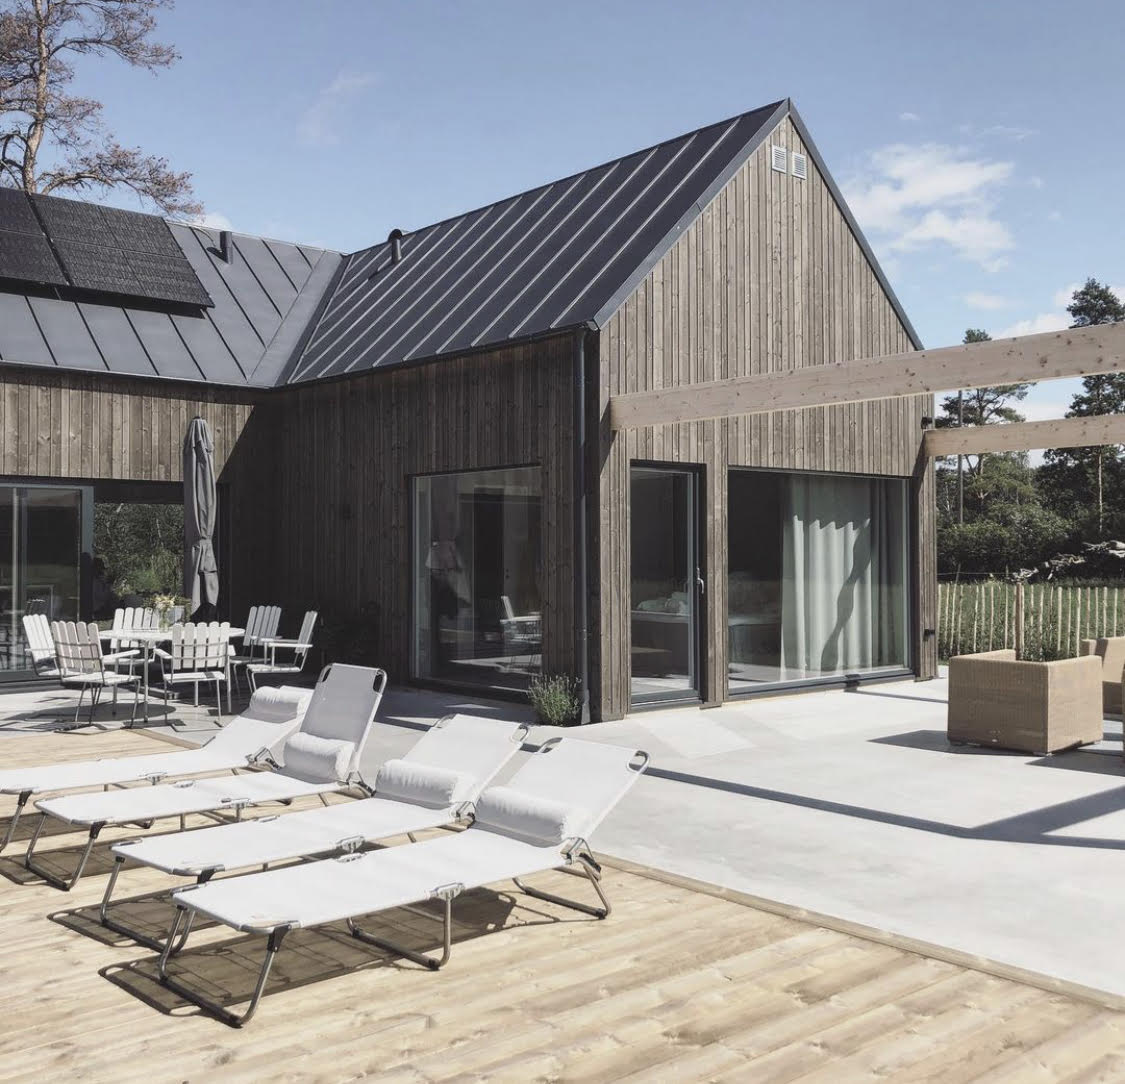 Arkitektritat-Fritidshus-Öland-1